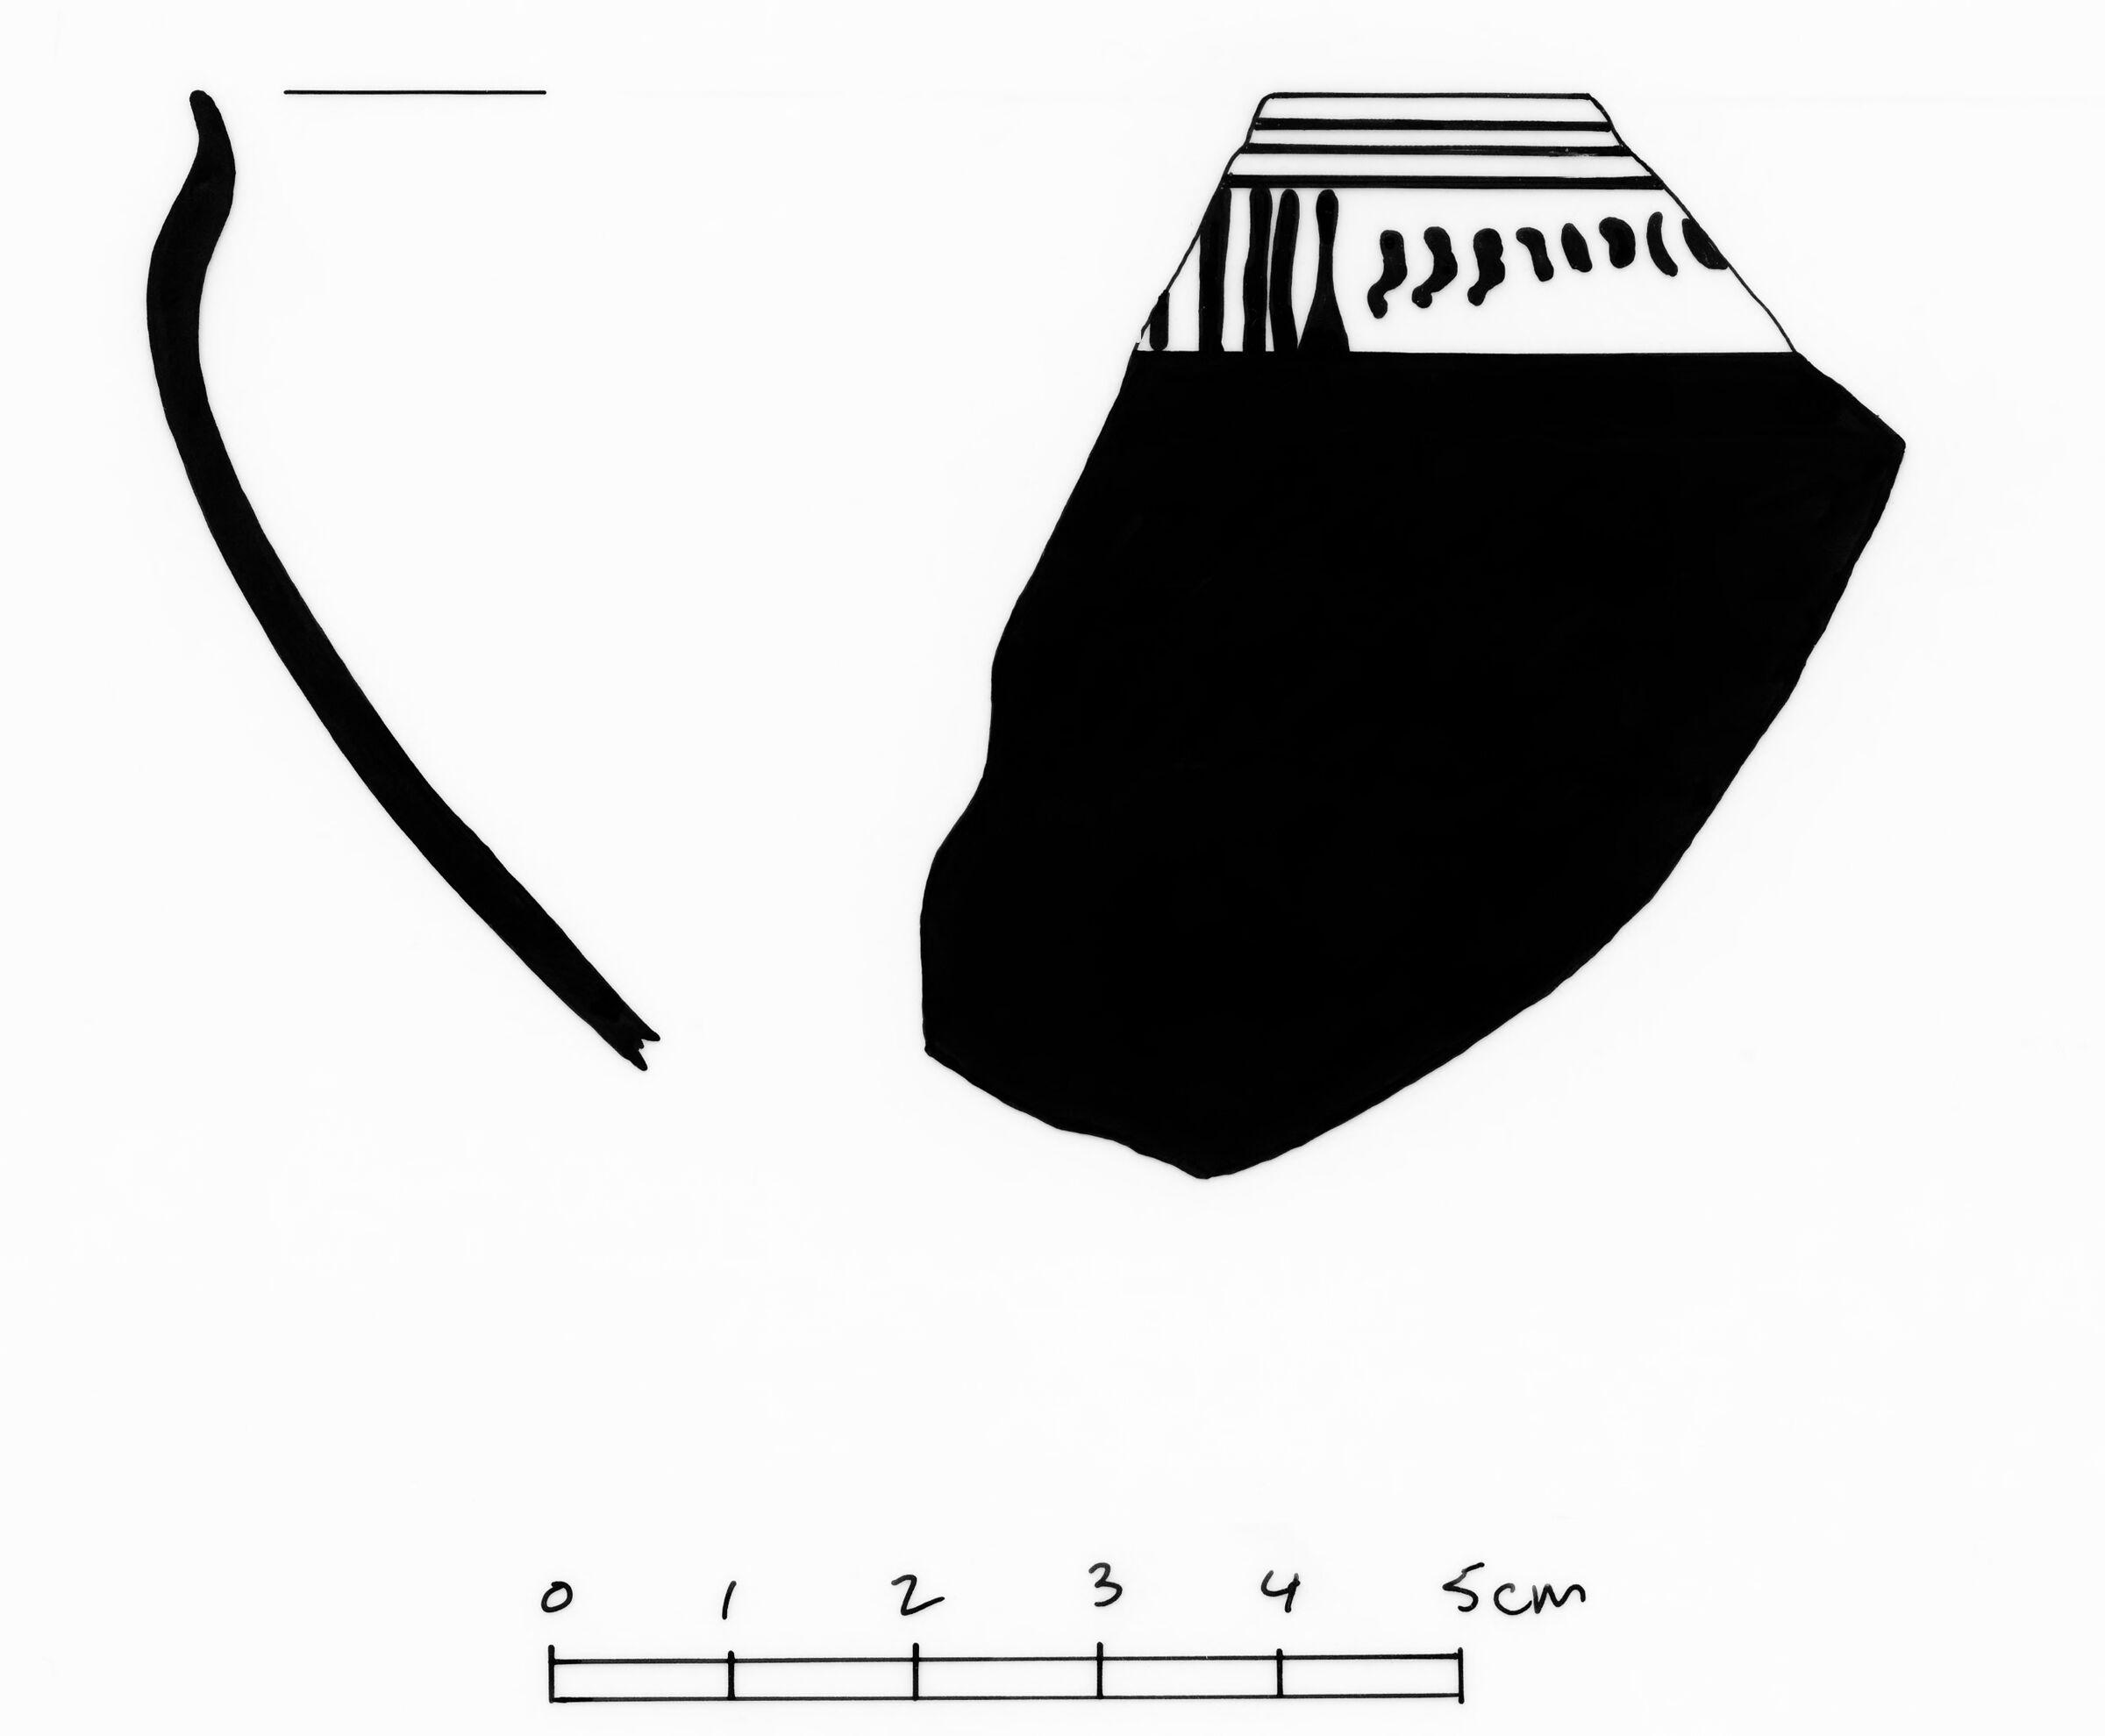 Corinthian Transitional Skyphos Fragments